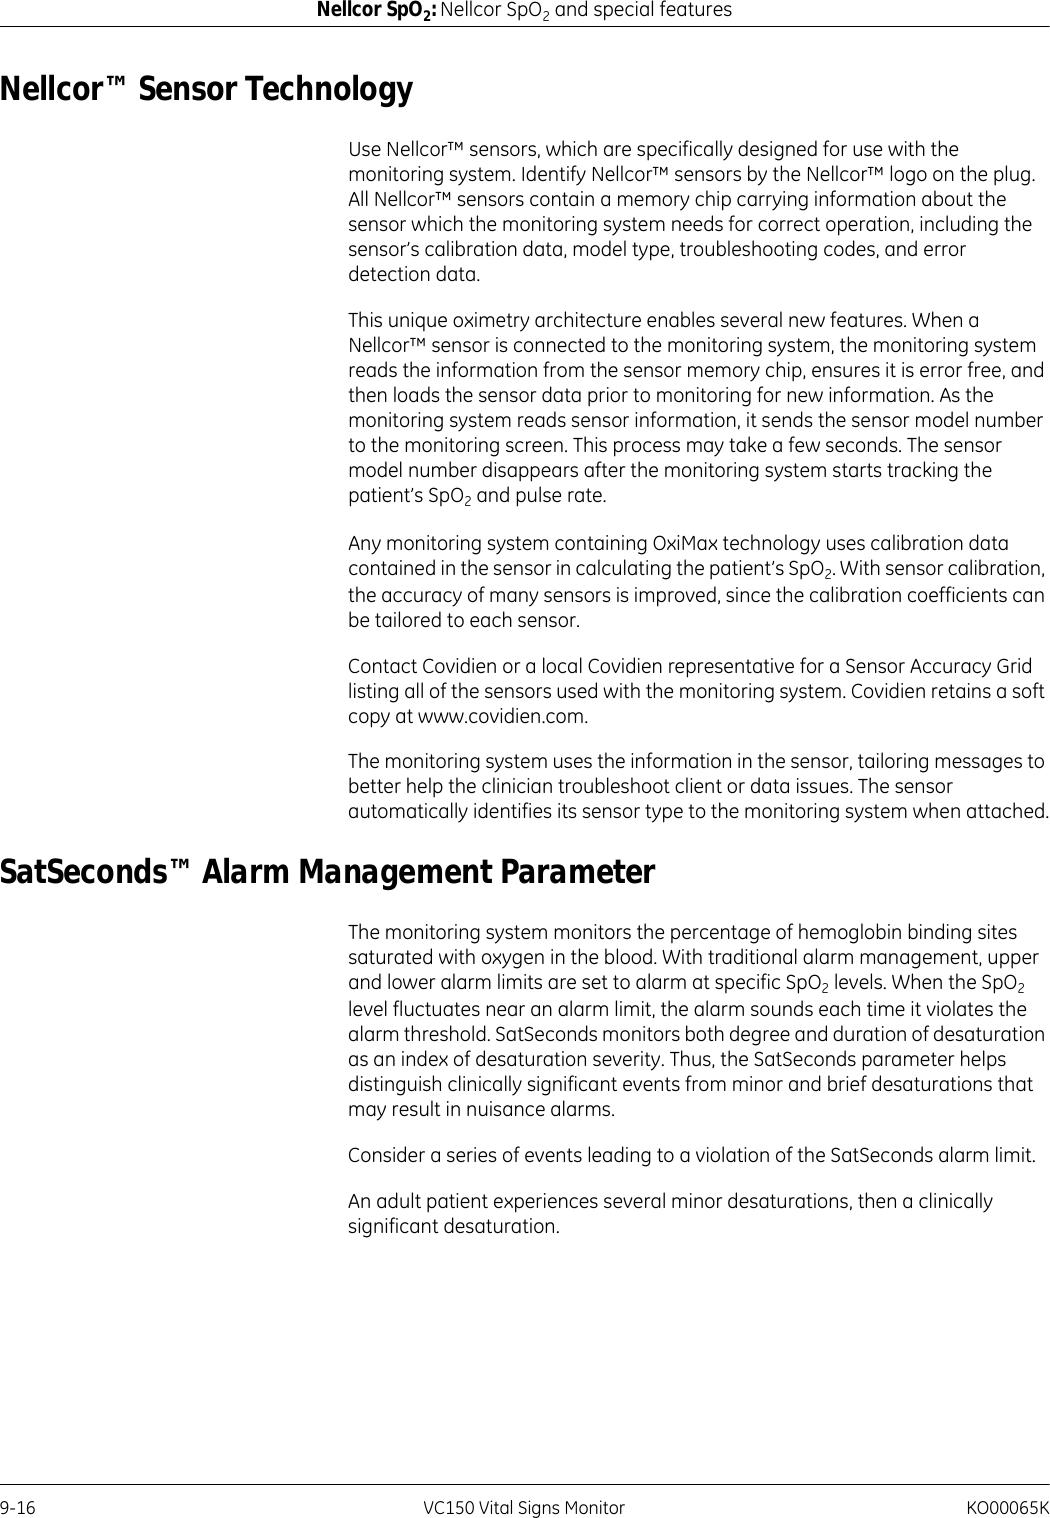 Innokas Yhtyma VC150 Patient Monitor User Manual